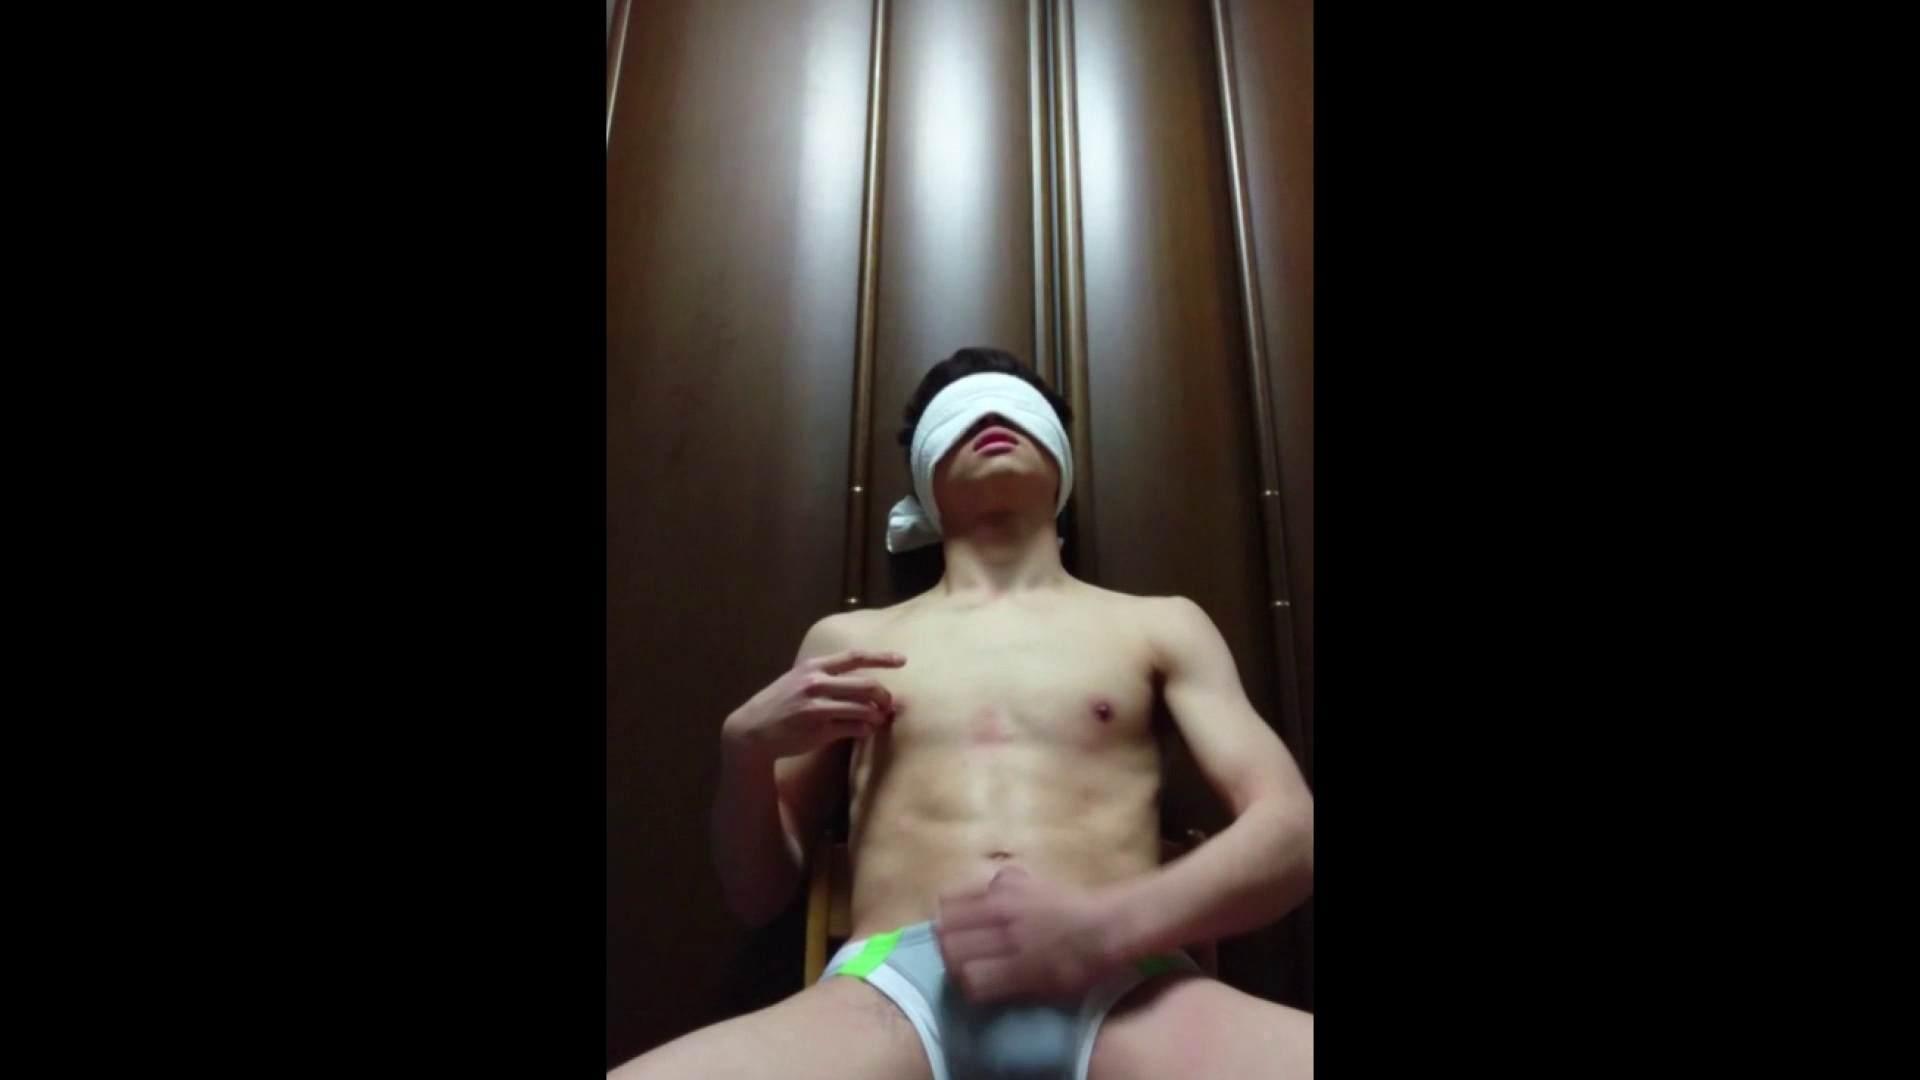 個人撮影 自慰の極意 Vol.21 無修正 男同士動画 93pic 93